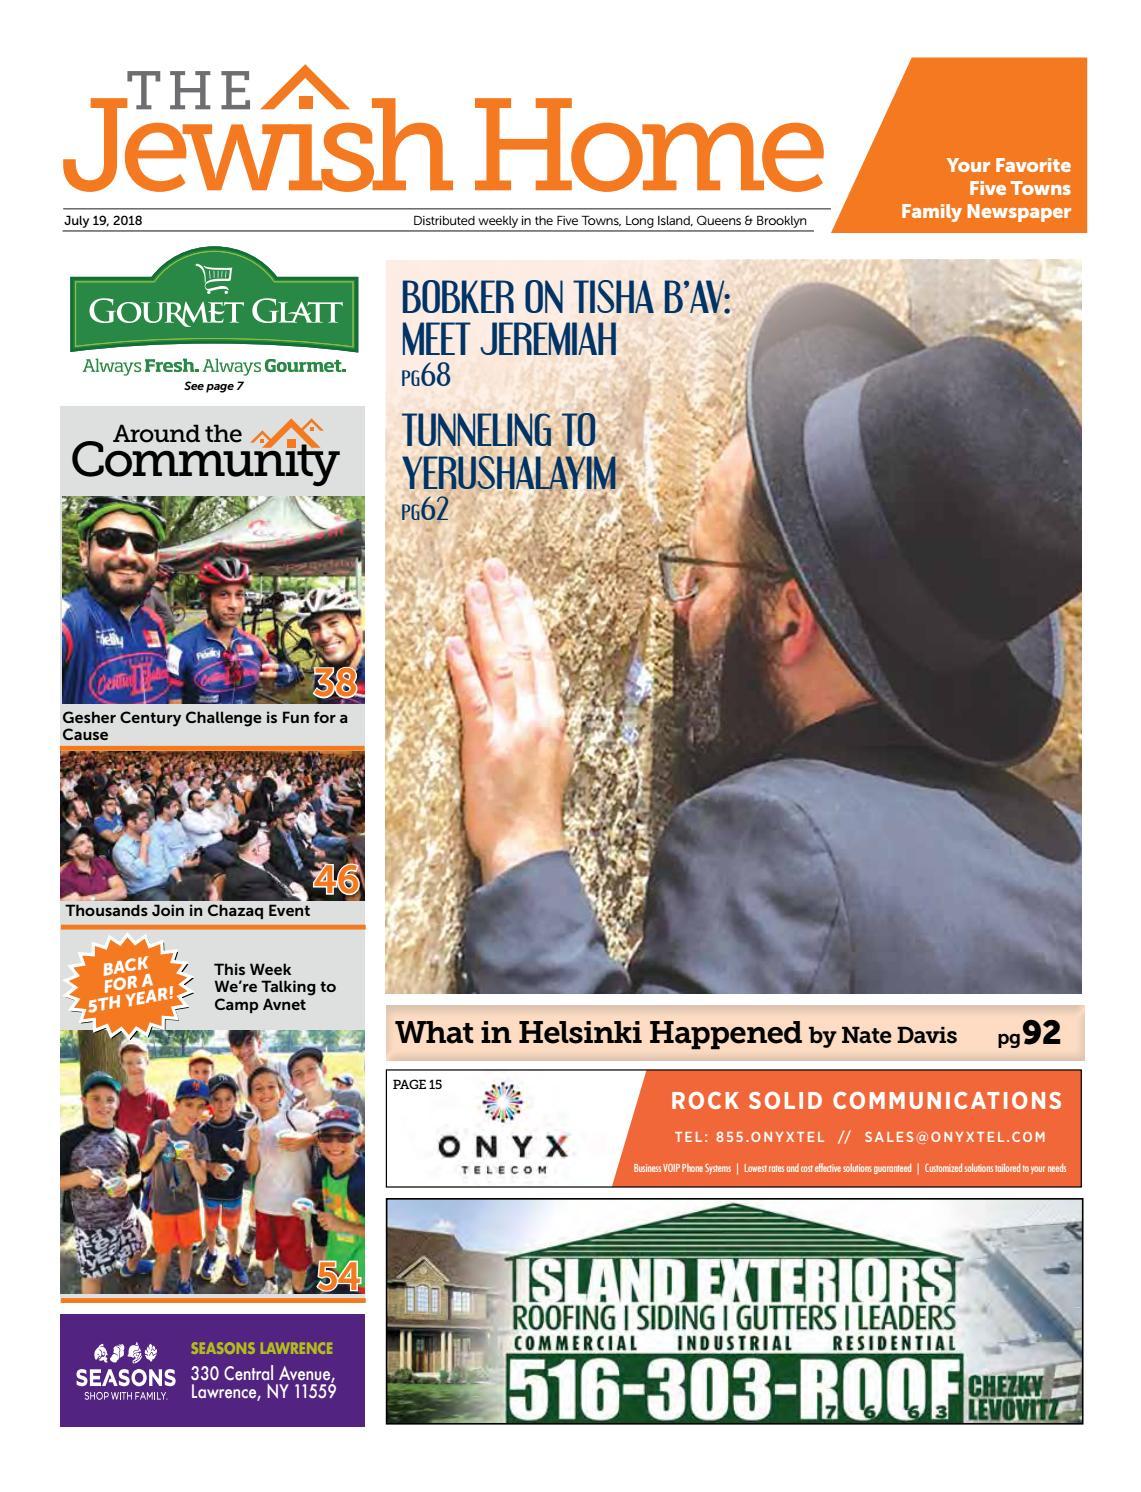 Five Towns Jewish Home - 7-19-18 by Yitzy Halpern - issuu